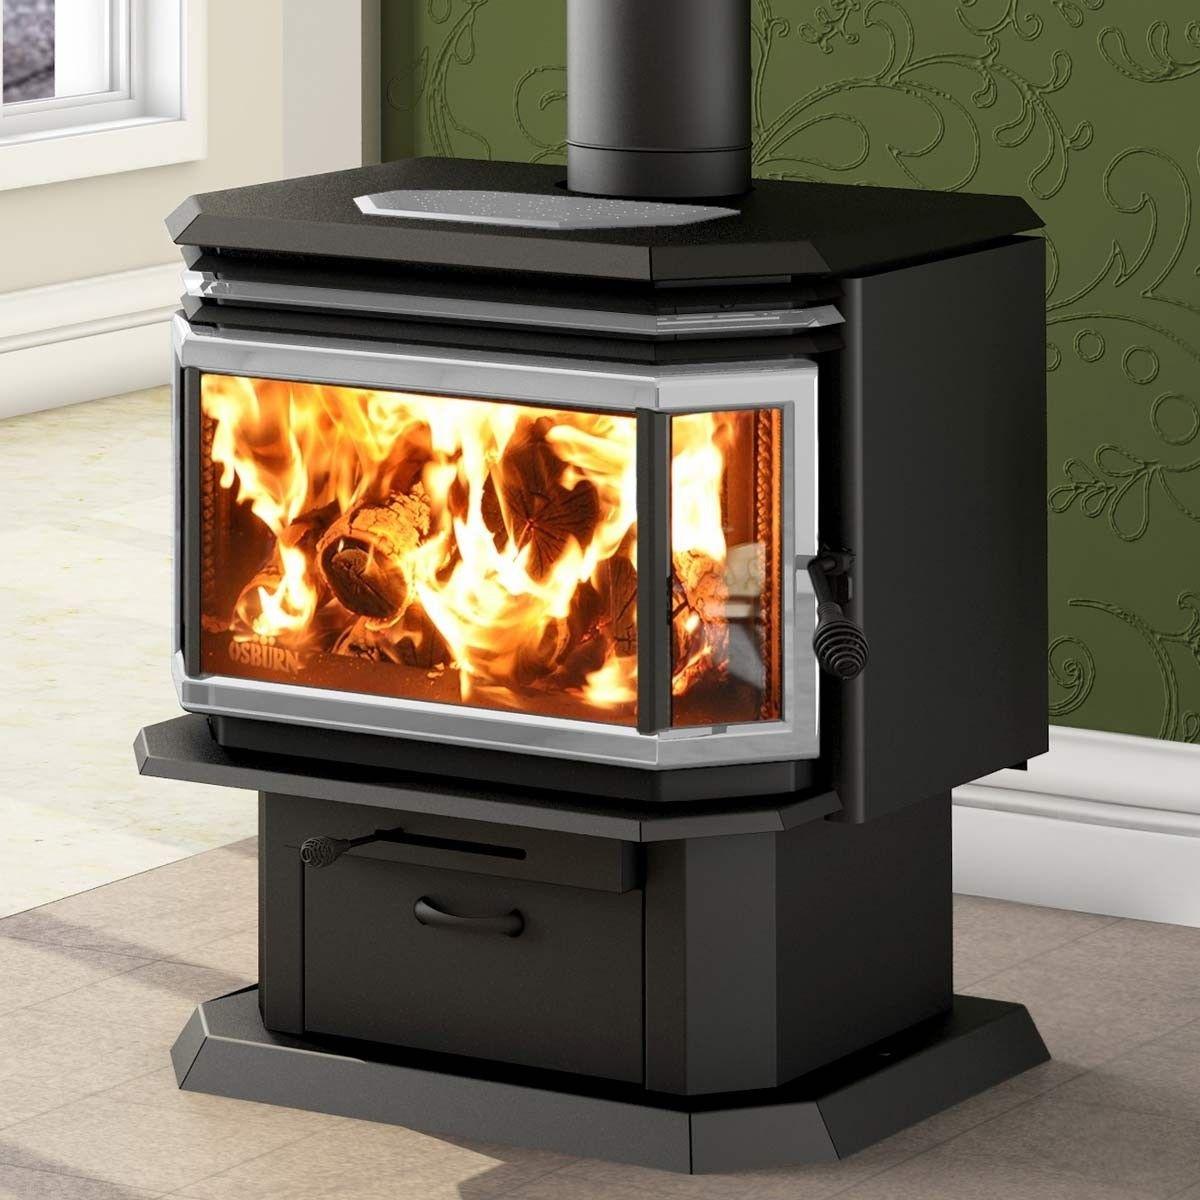 Wood Stove Fireplace Luxury Osburn 2200 Metallic Black Epa Wood Stove Ob In 2019